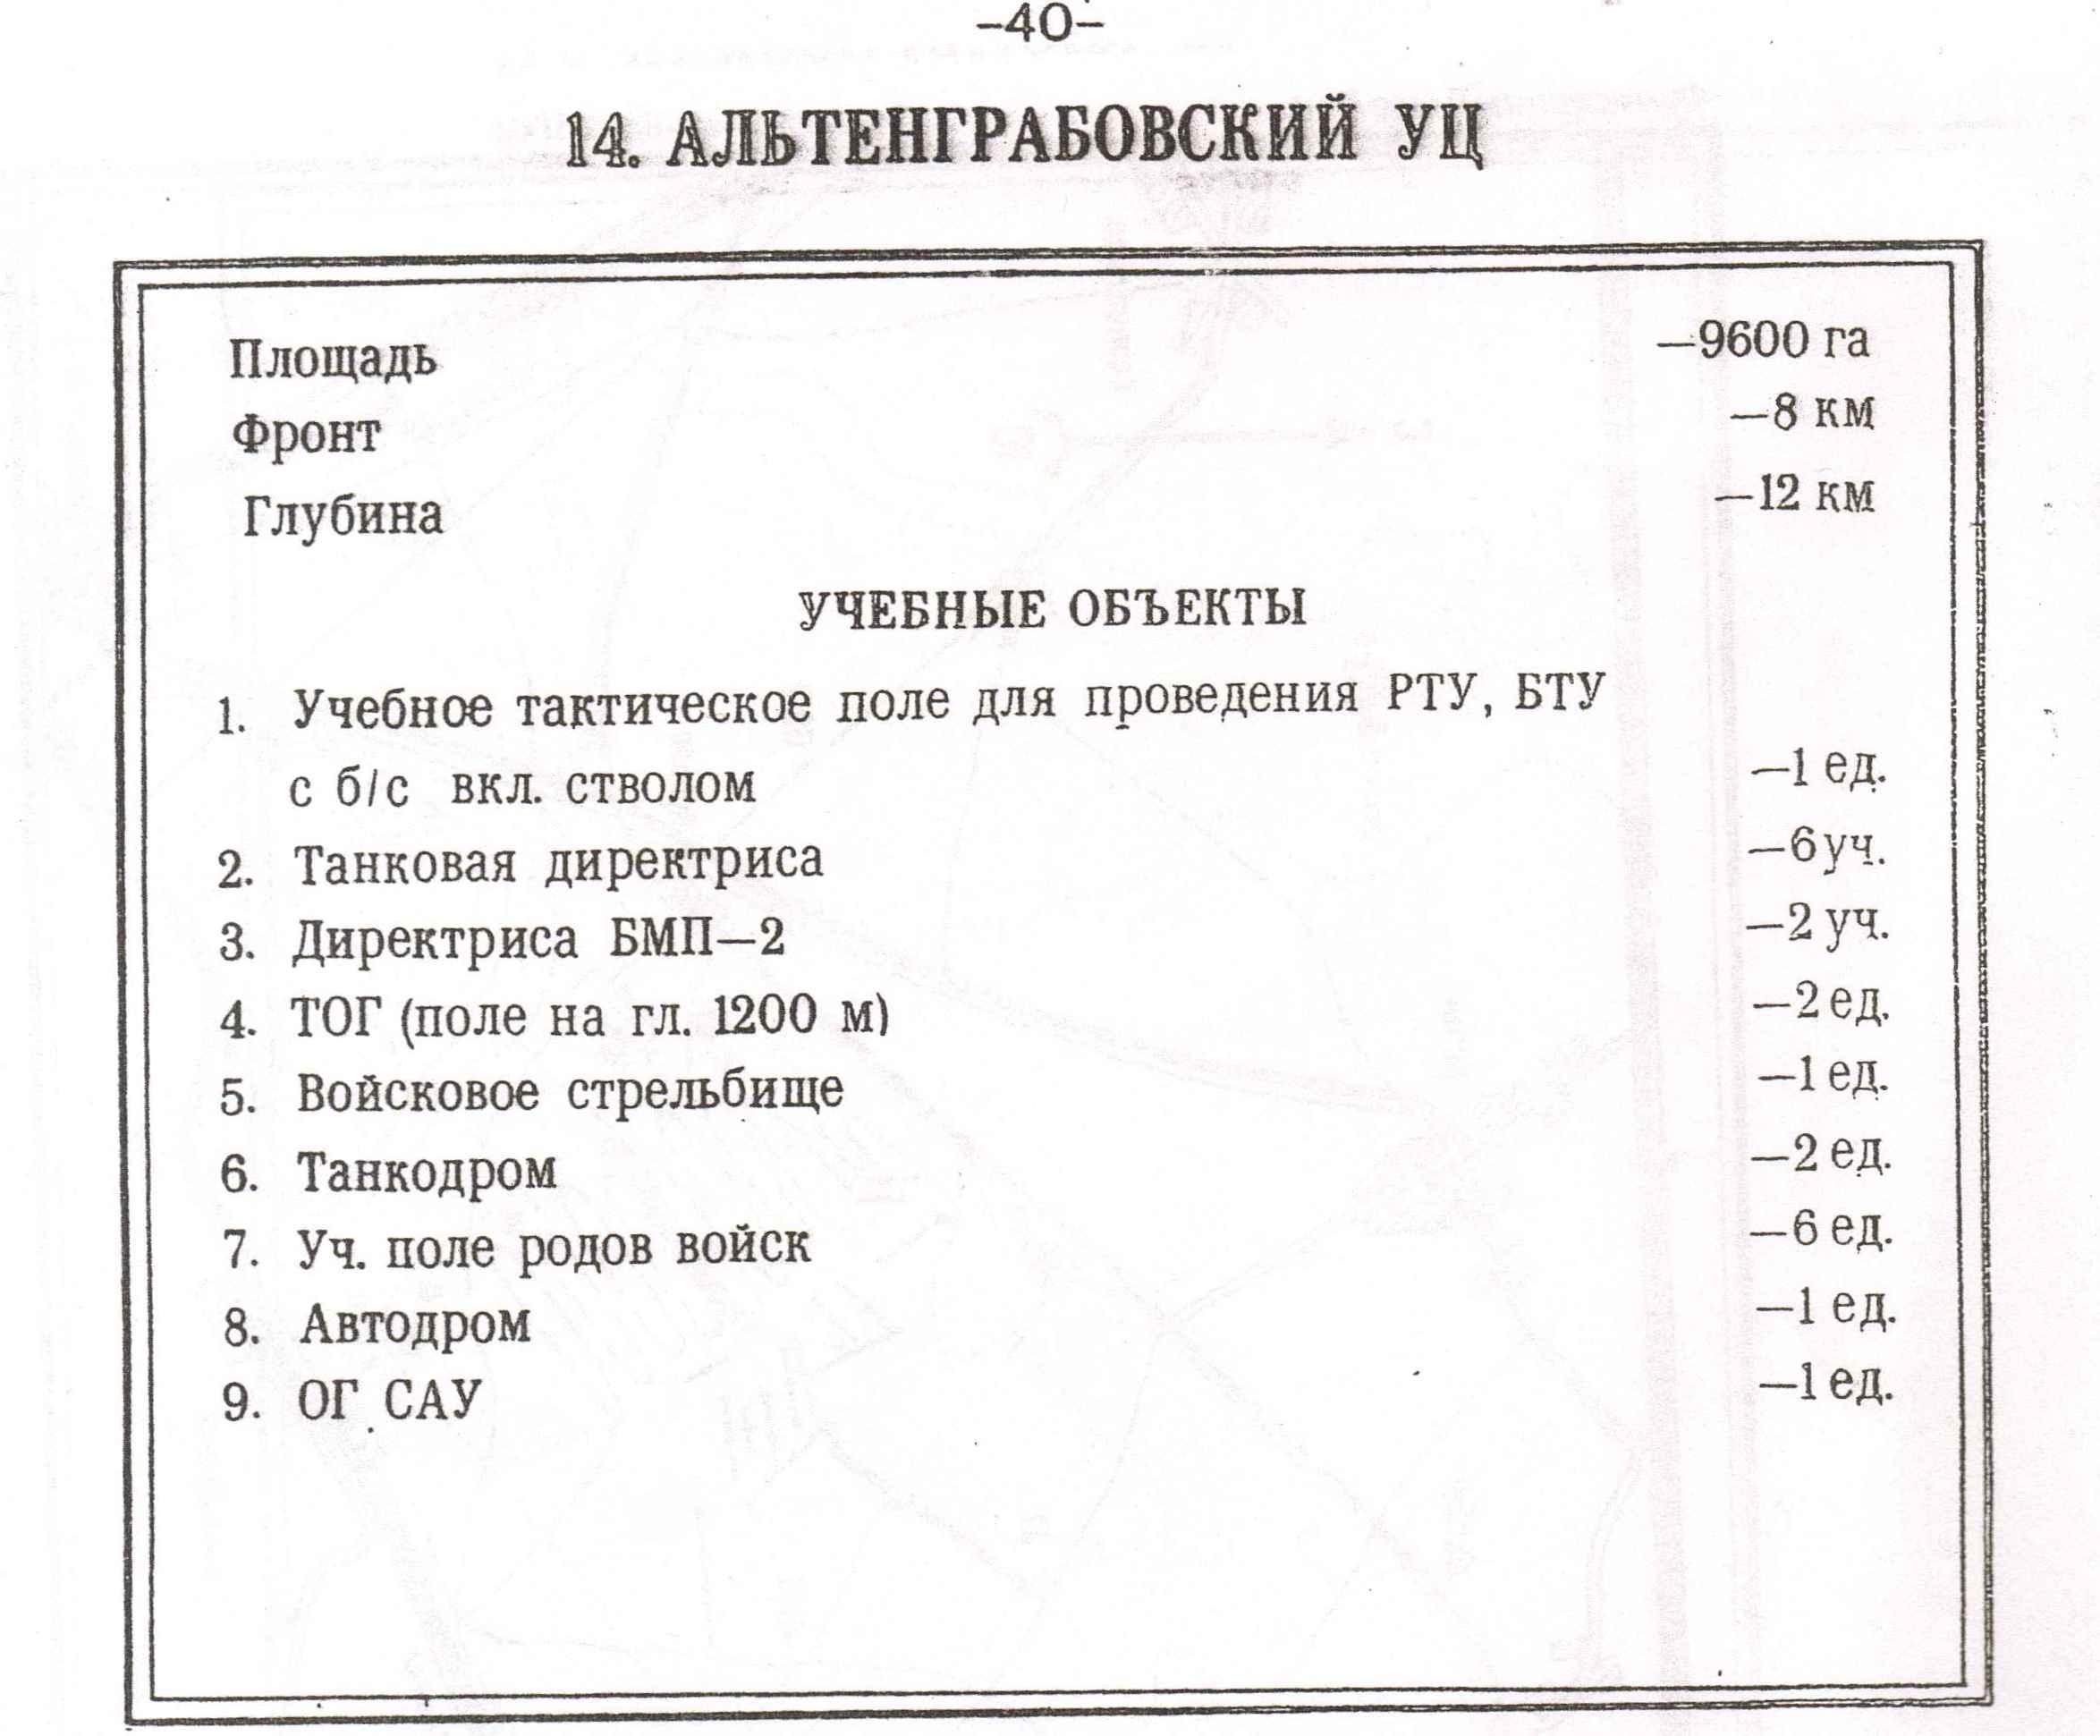 http://sf.uploads.ru/wHSYs.jpg